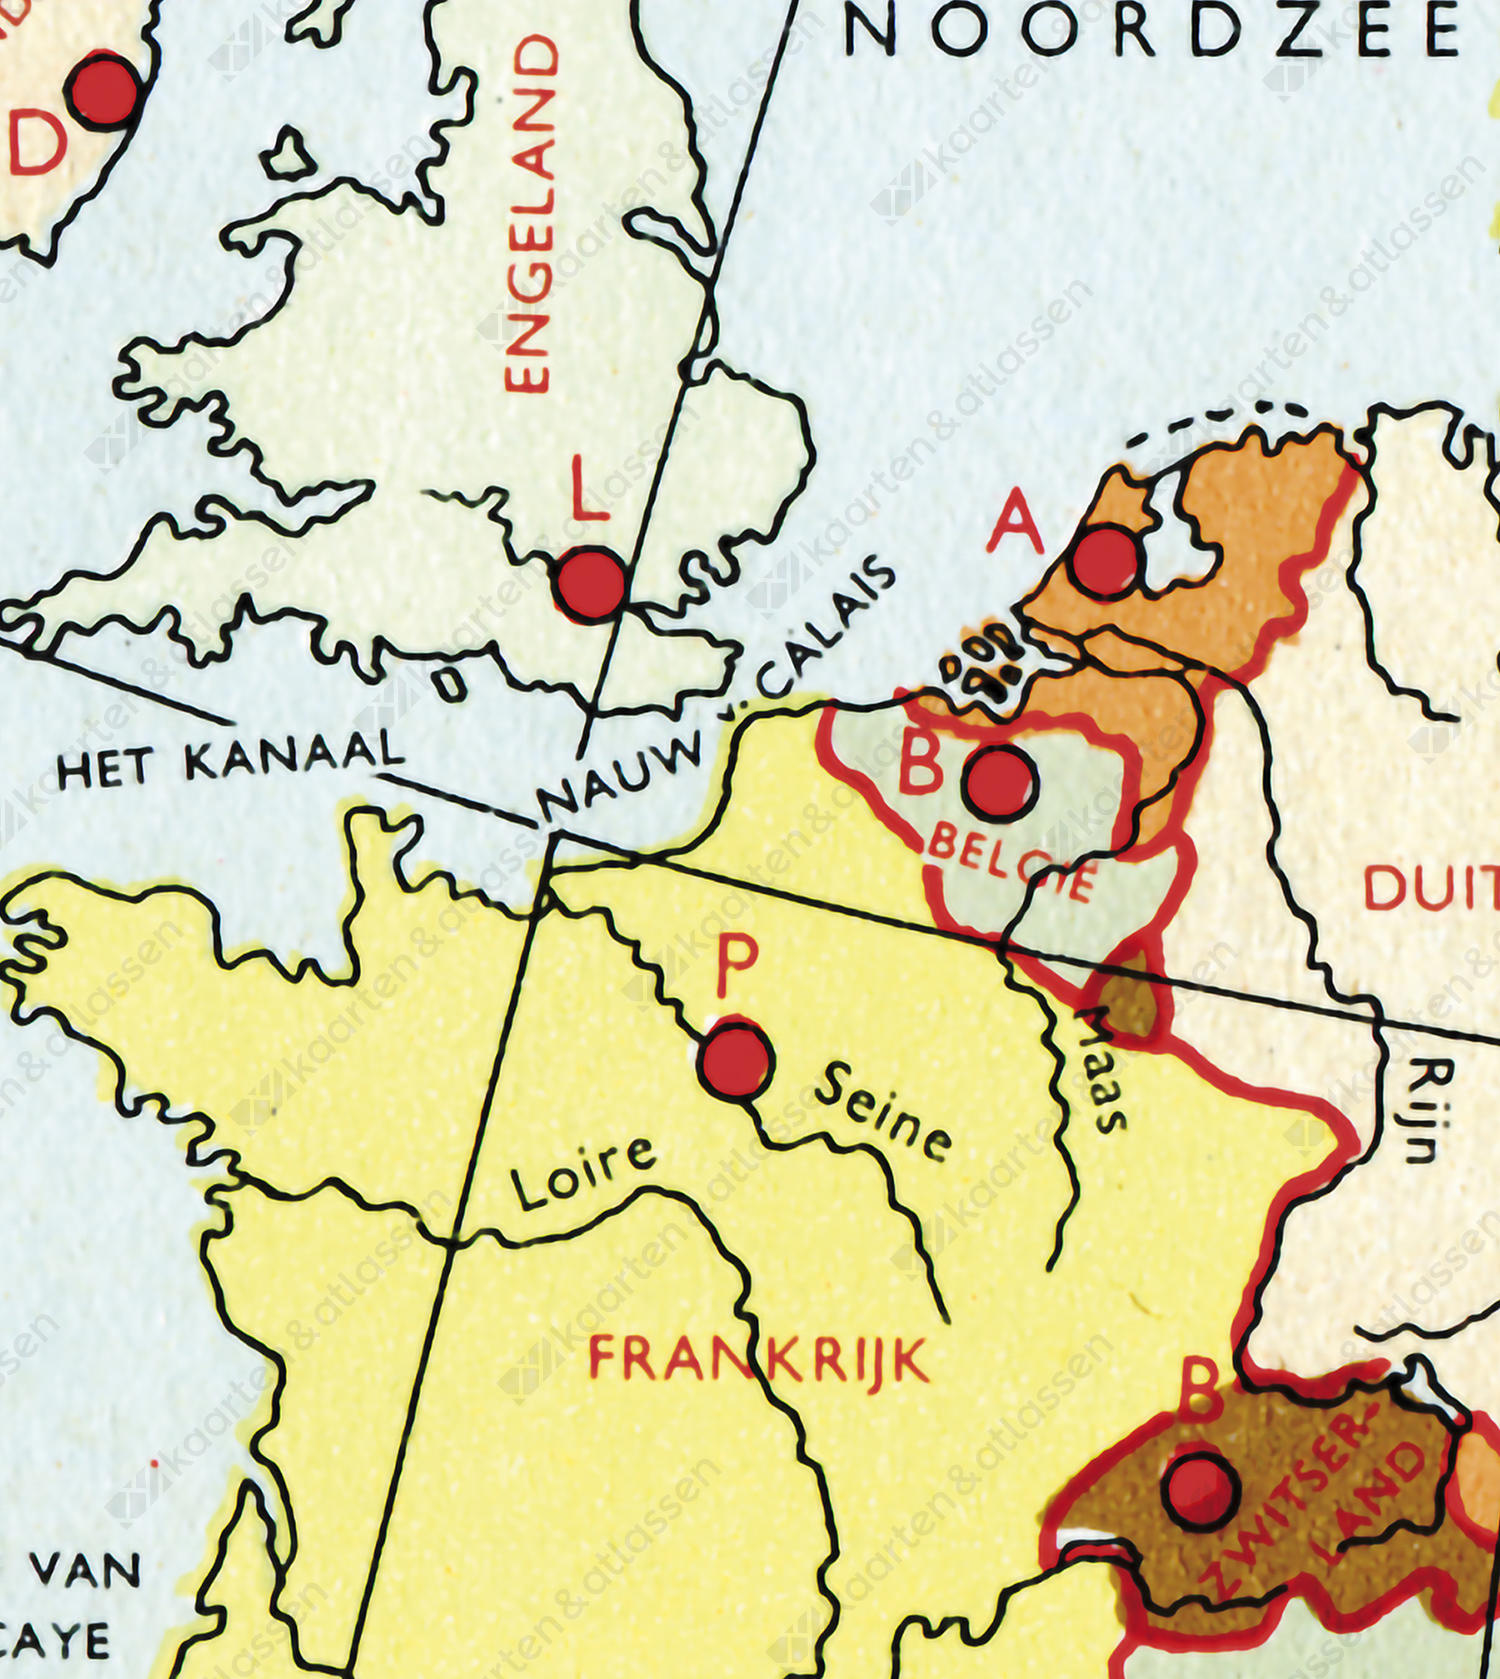 Europa Schoolkaart anno 1951